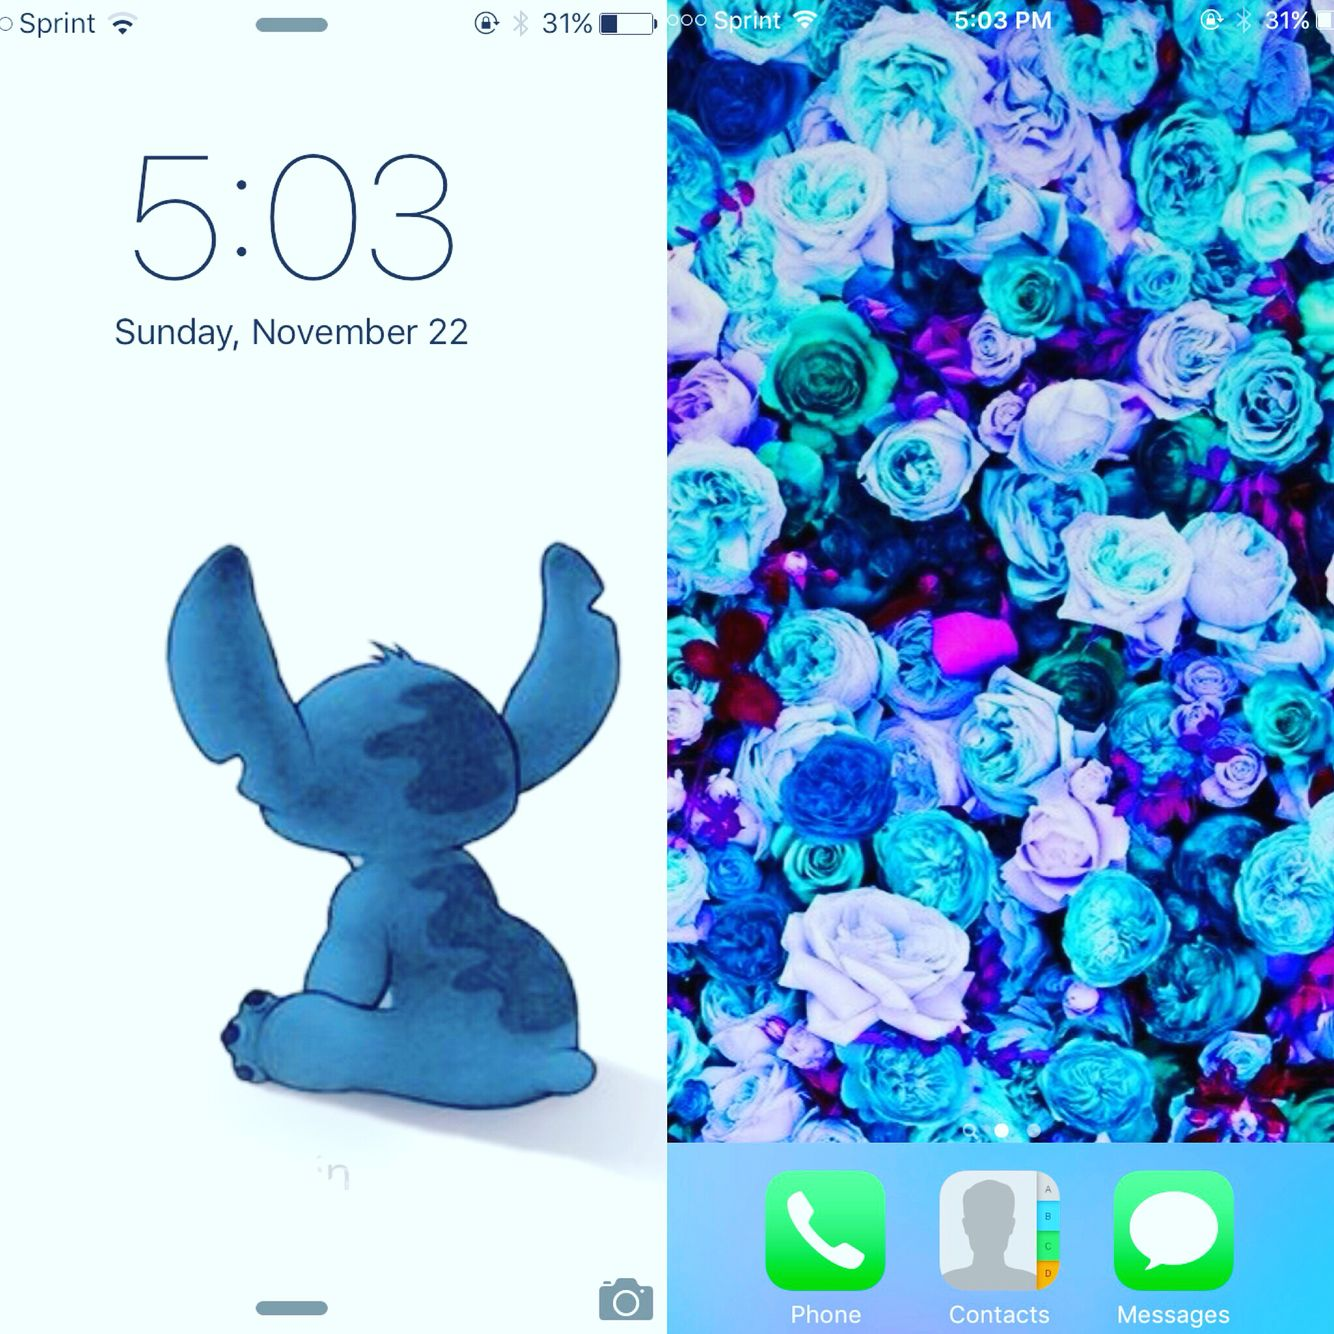 Wallpaper iphone stitch - Wallpaper Iphone Stitch Blue Iphone 6s Stitch Wallpaper